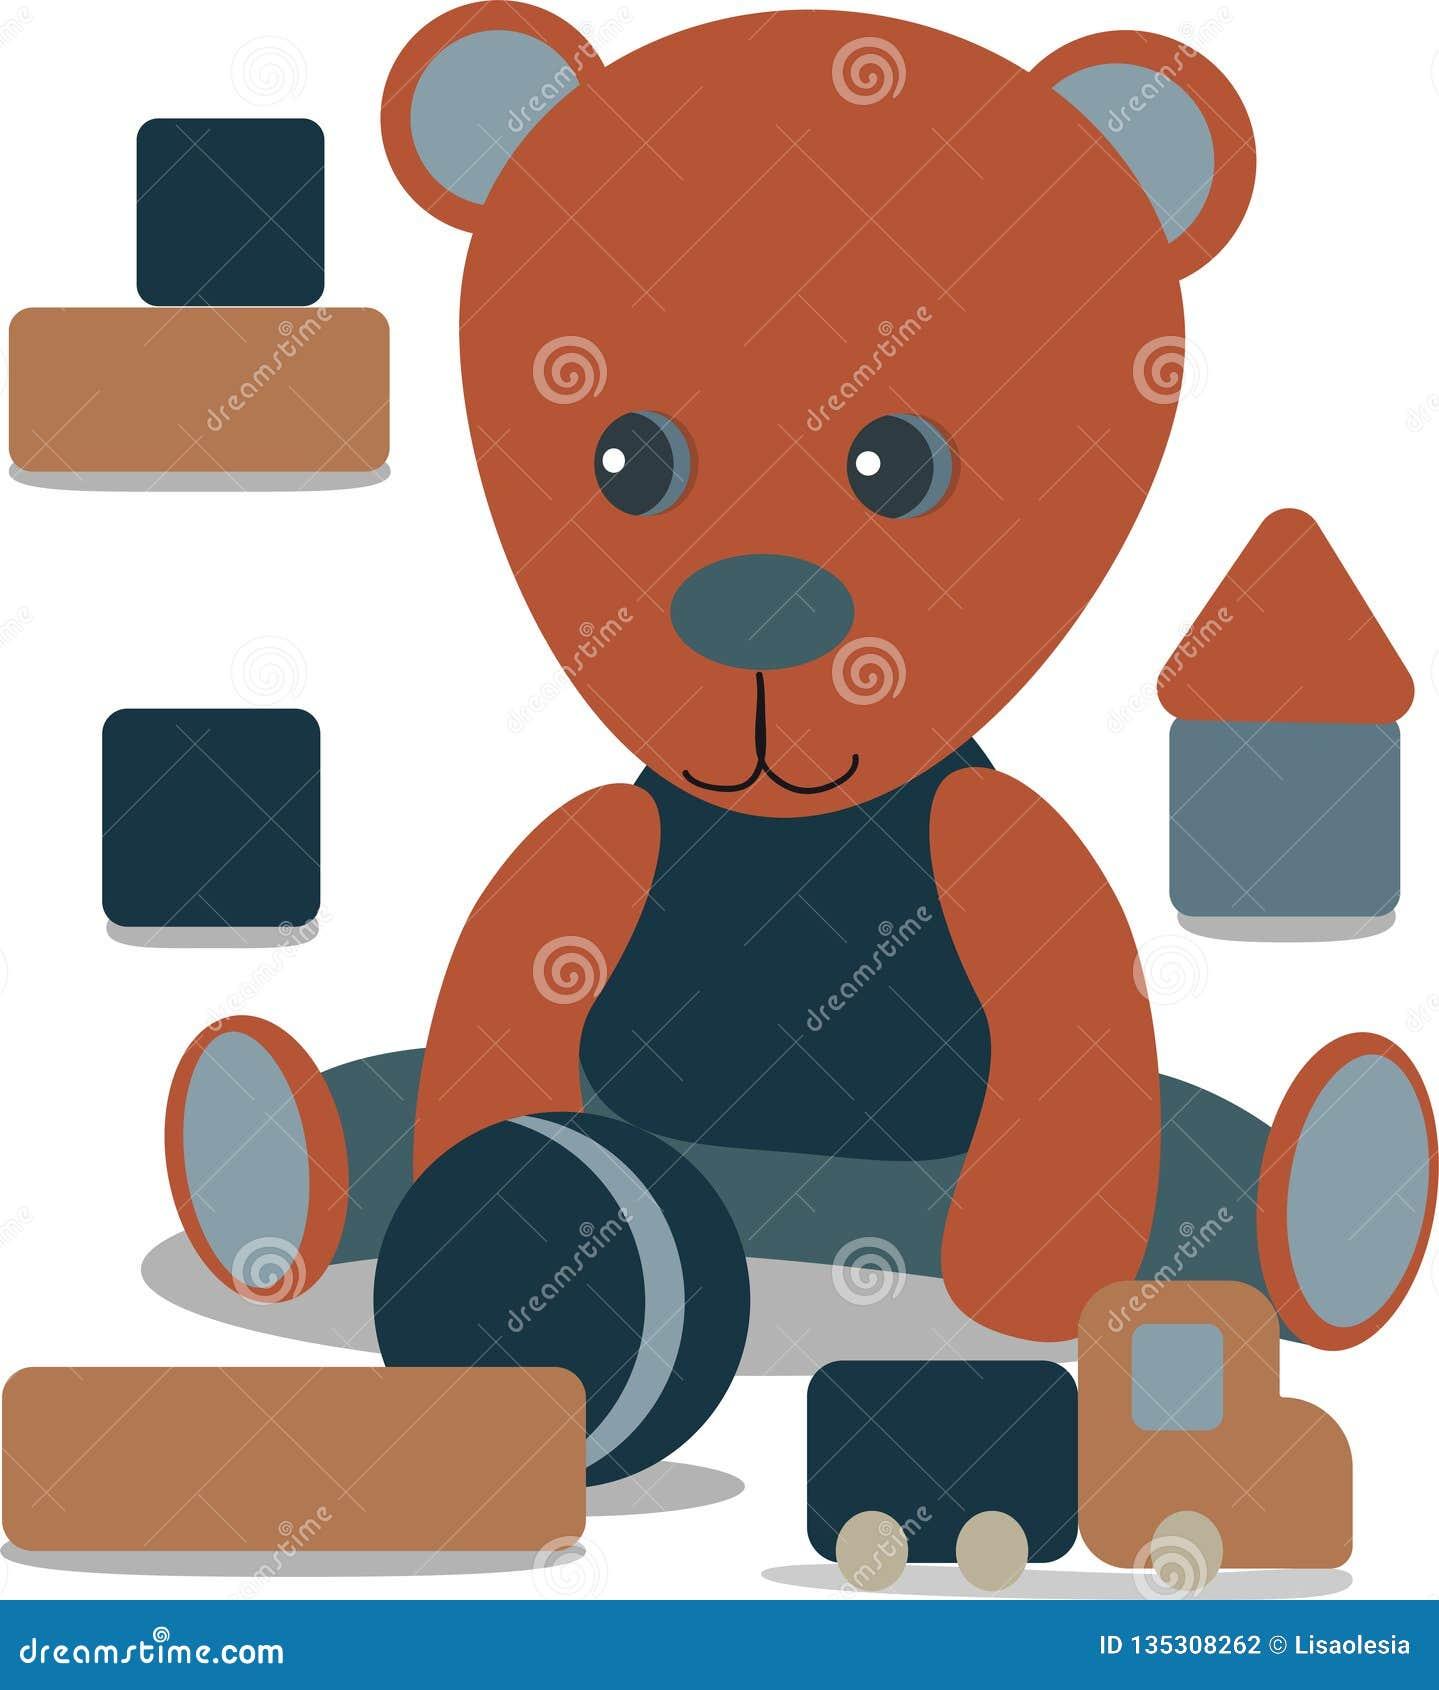 Teddy bear with toy, ball, Baby announcement metric card grey and blue color. nursery decor